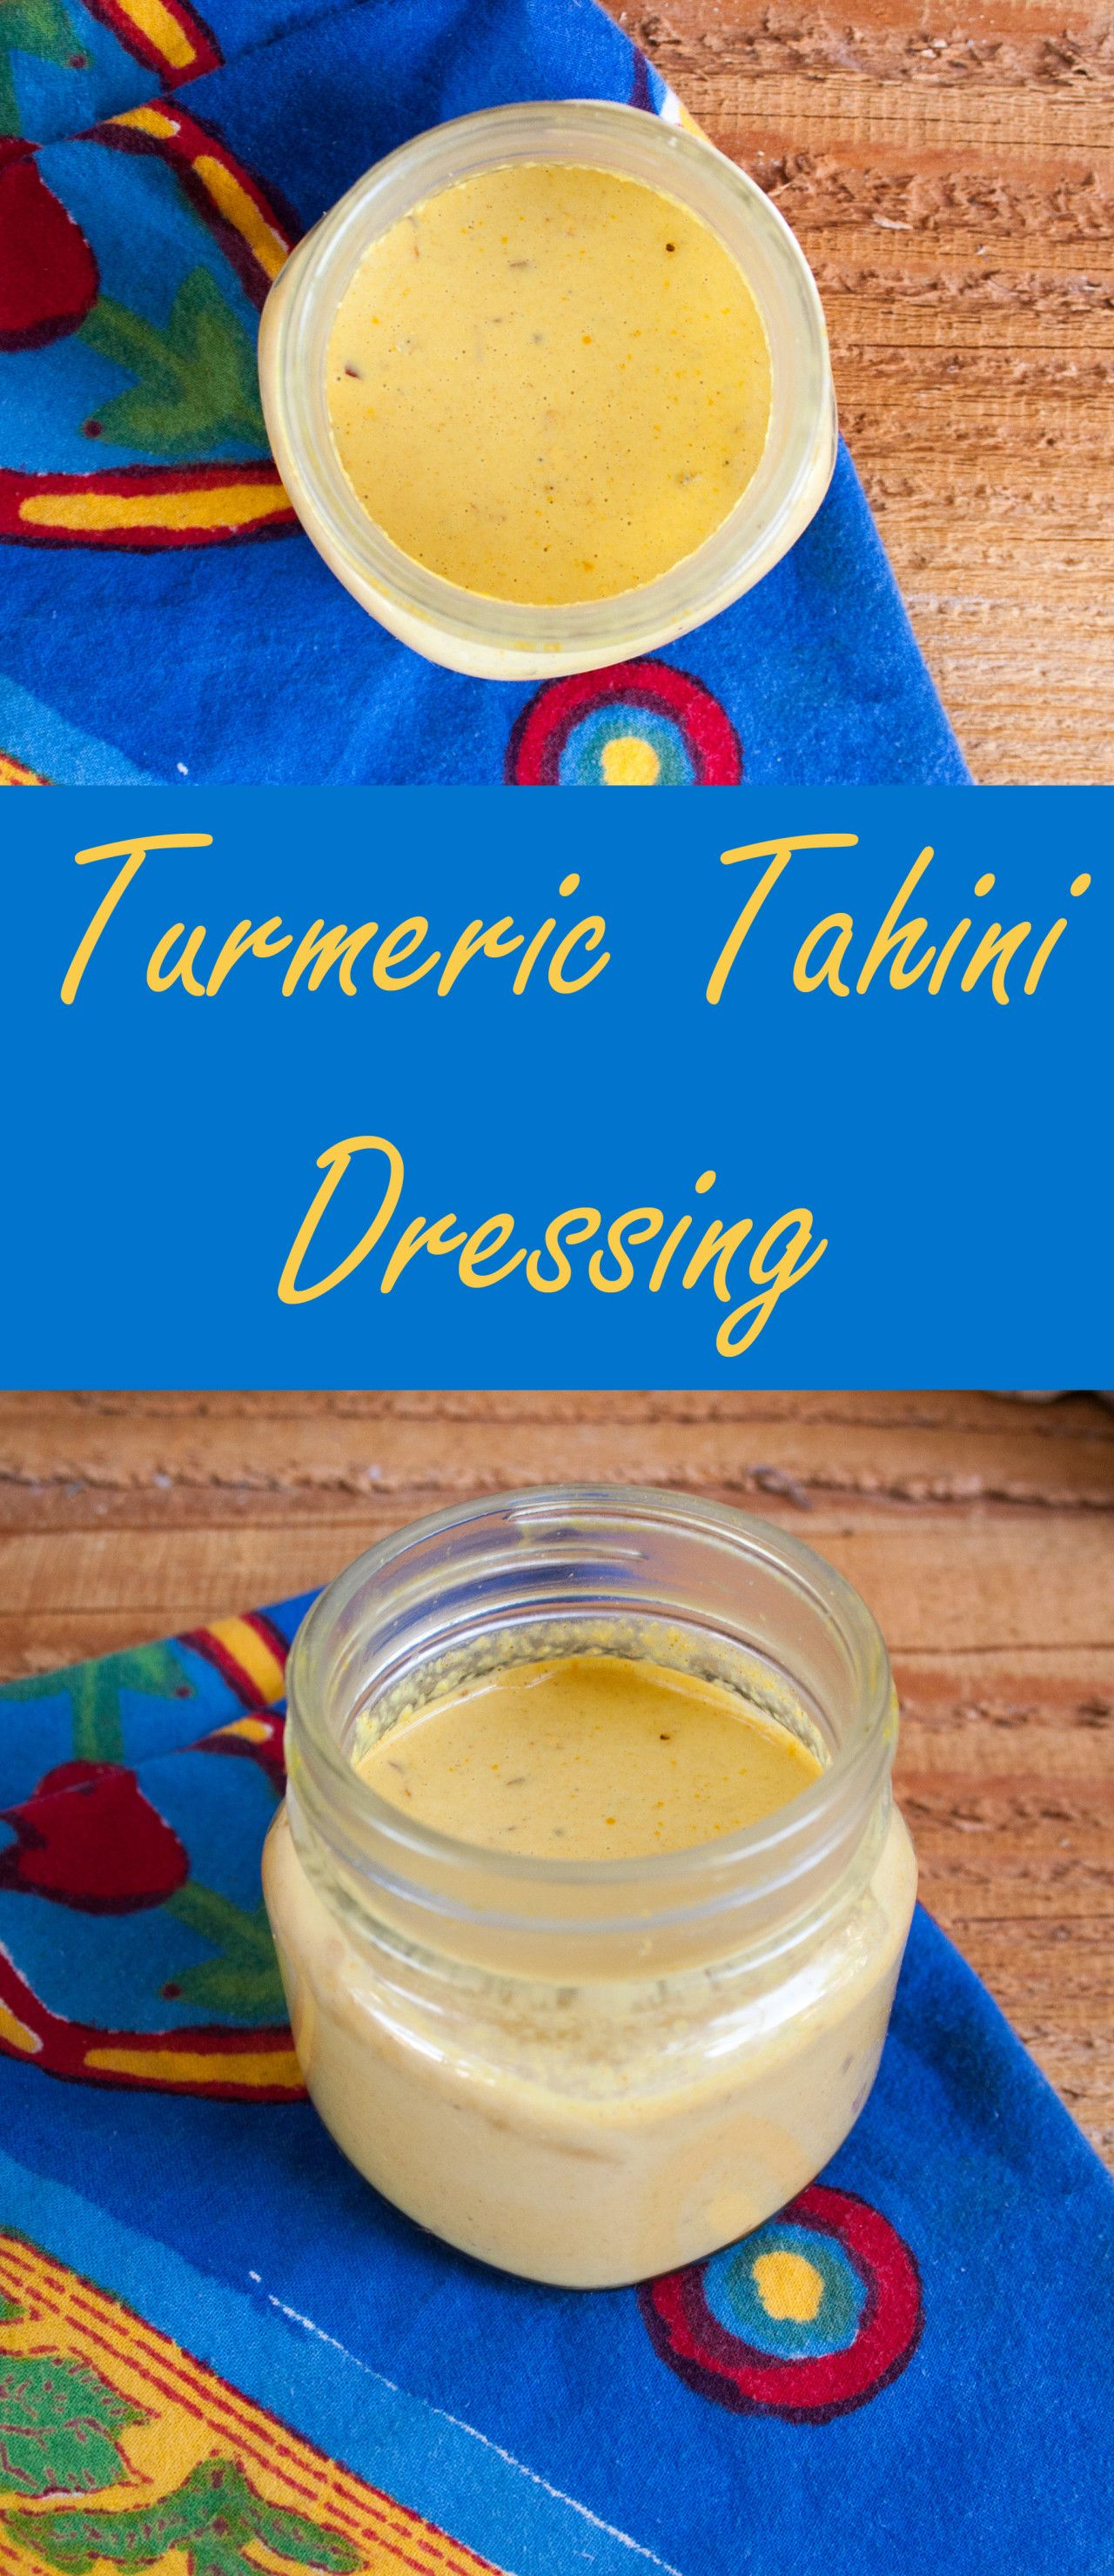 Turmeric Tahini Dressing Vegan Gluten Free This Savory Dressing Is Really Versatile It Goes Well With Sweet And Savo Tahini Dressing Tahini Tahini Recipe [ 2960 x 1280 Pixel ]